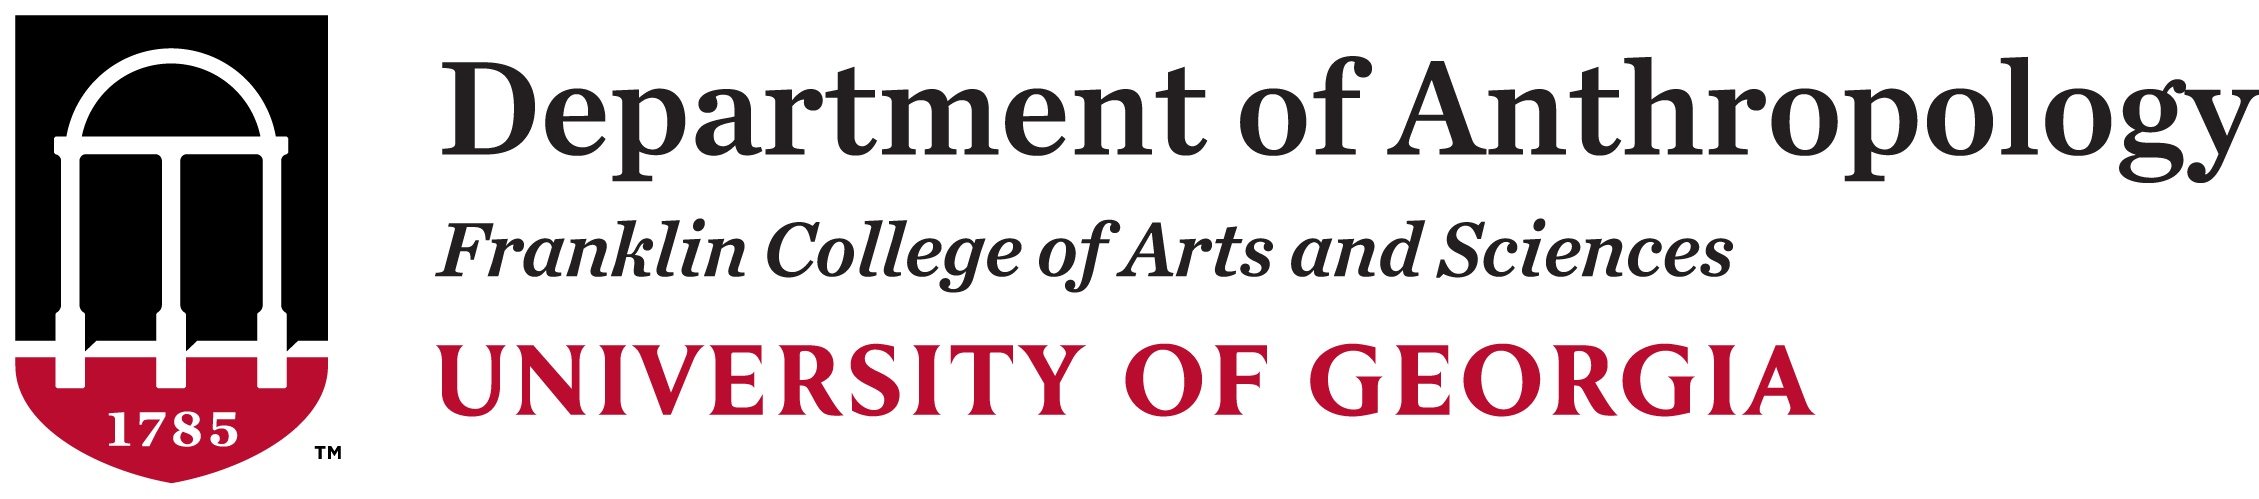 Nsf dissertation improvement grant